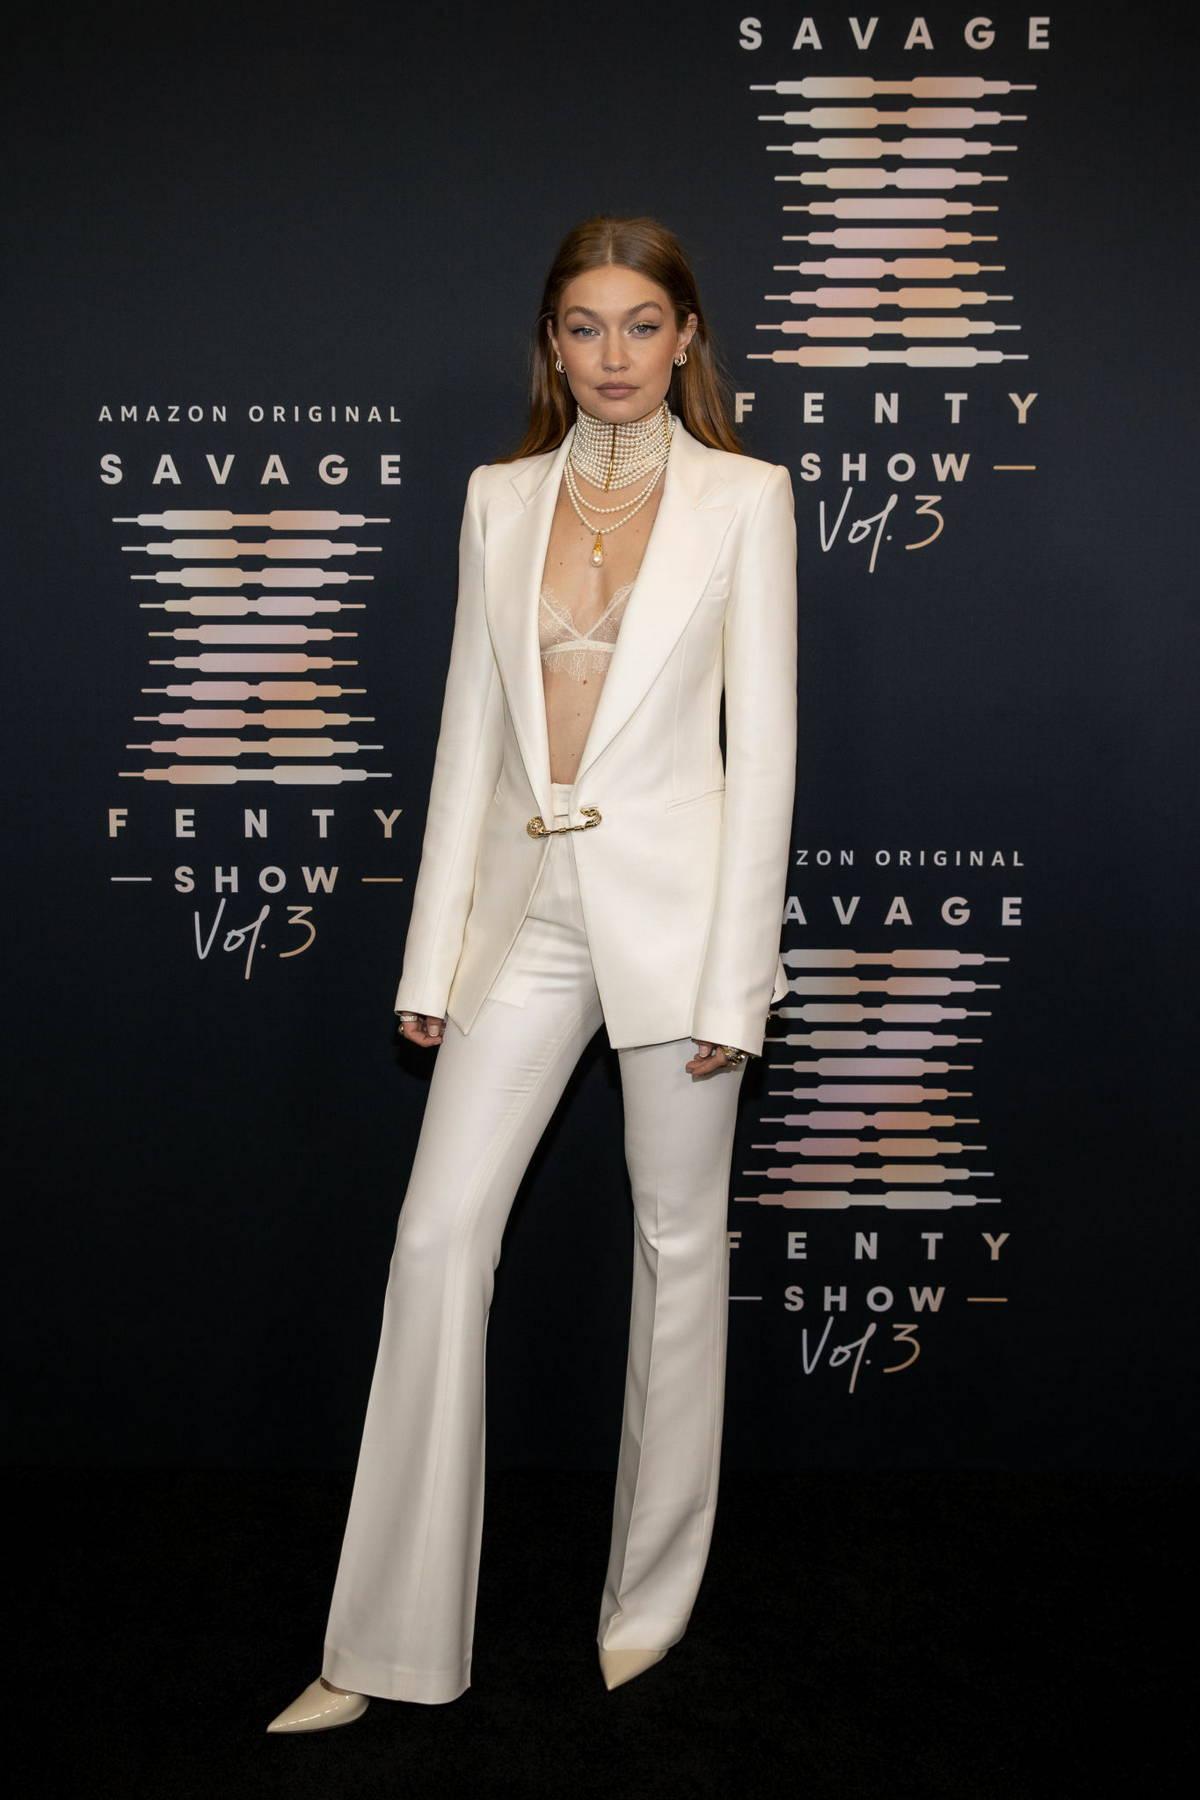 Gigi Hadid attends the Savage x Fenty Show Vol 3 in Los Angeles